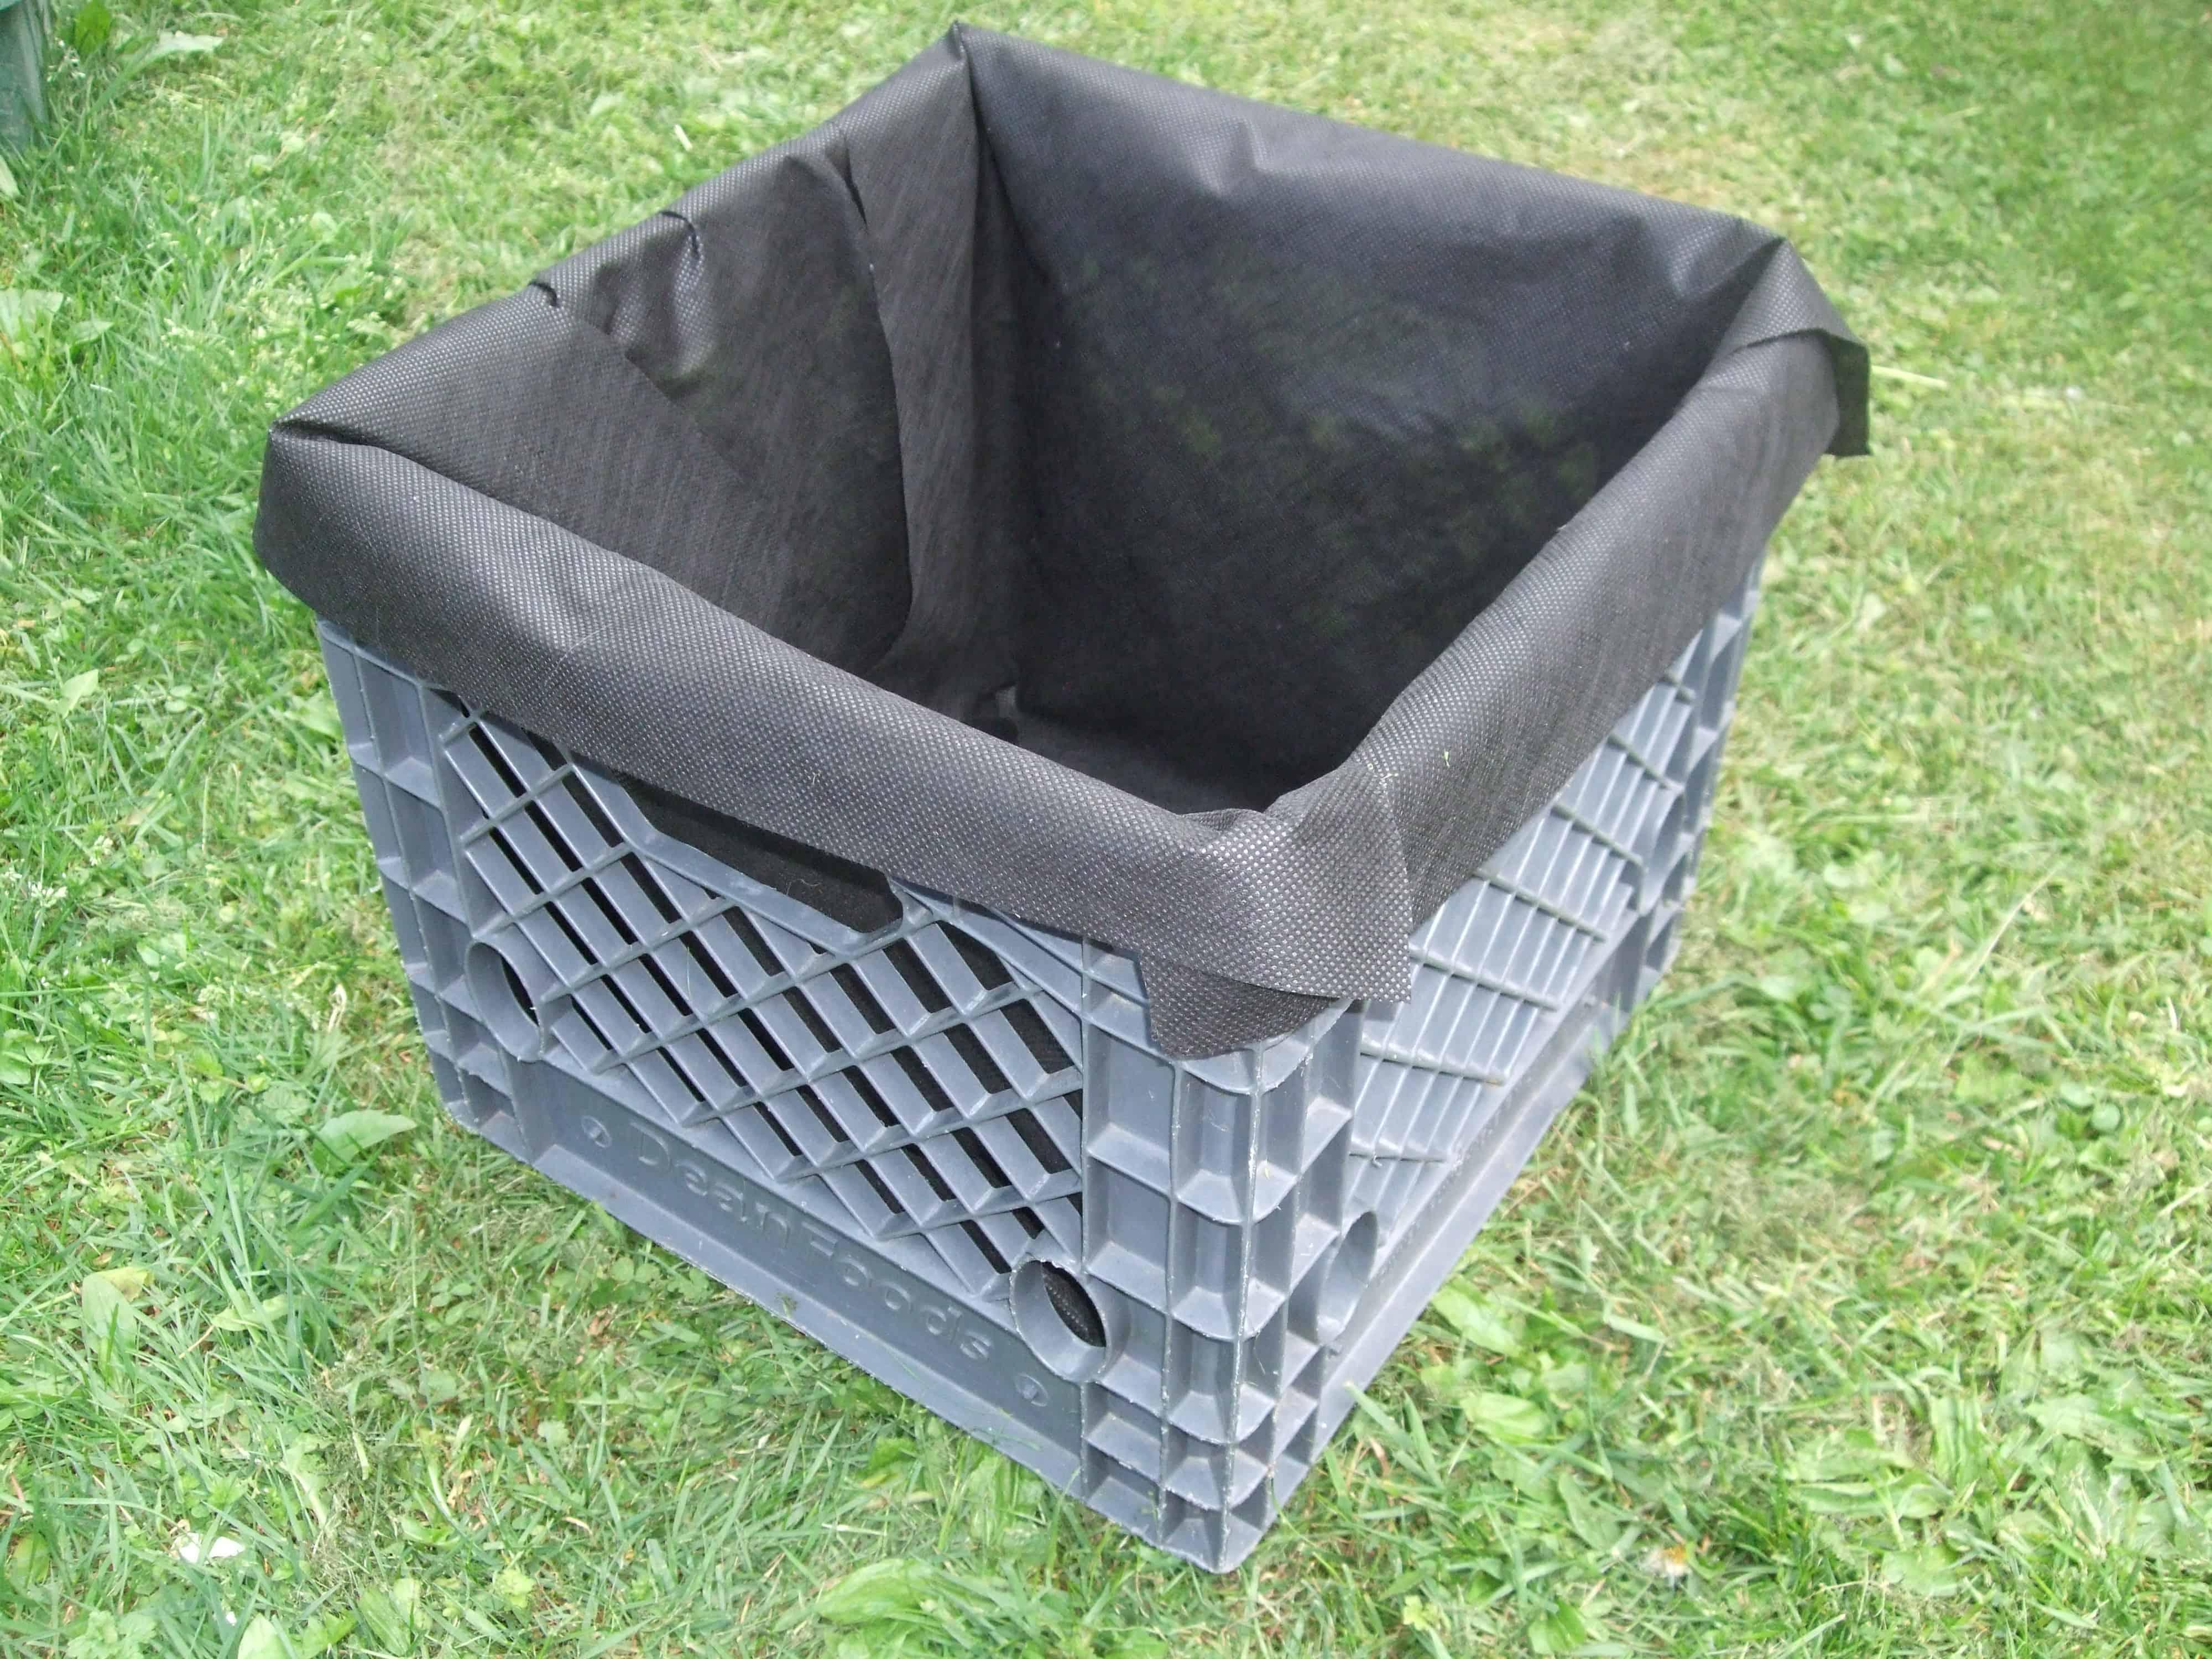 how to make a milk crate garden - Milk Crate Garden